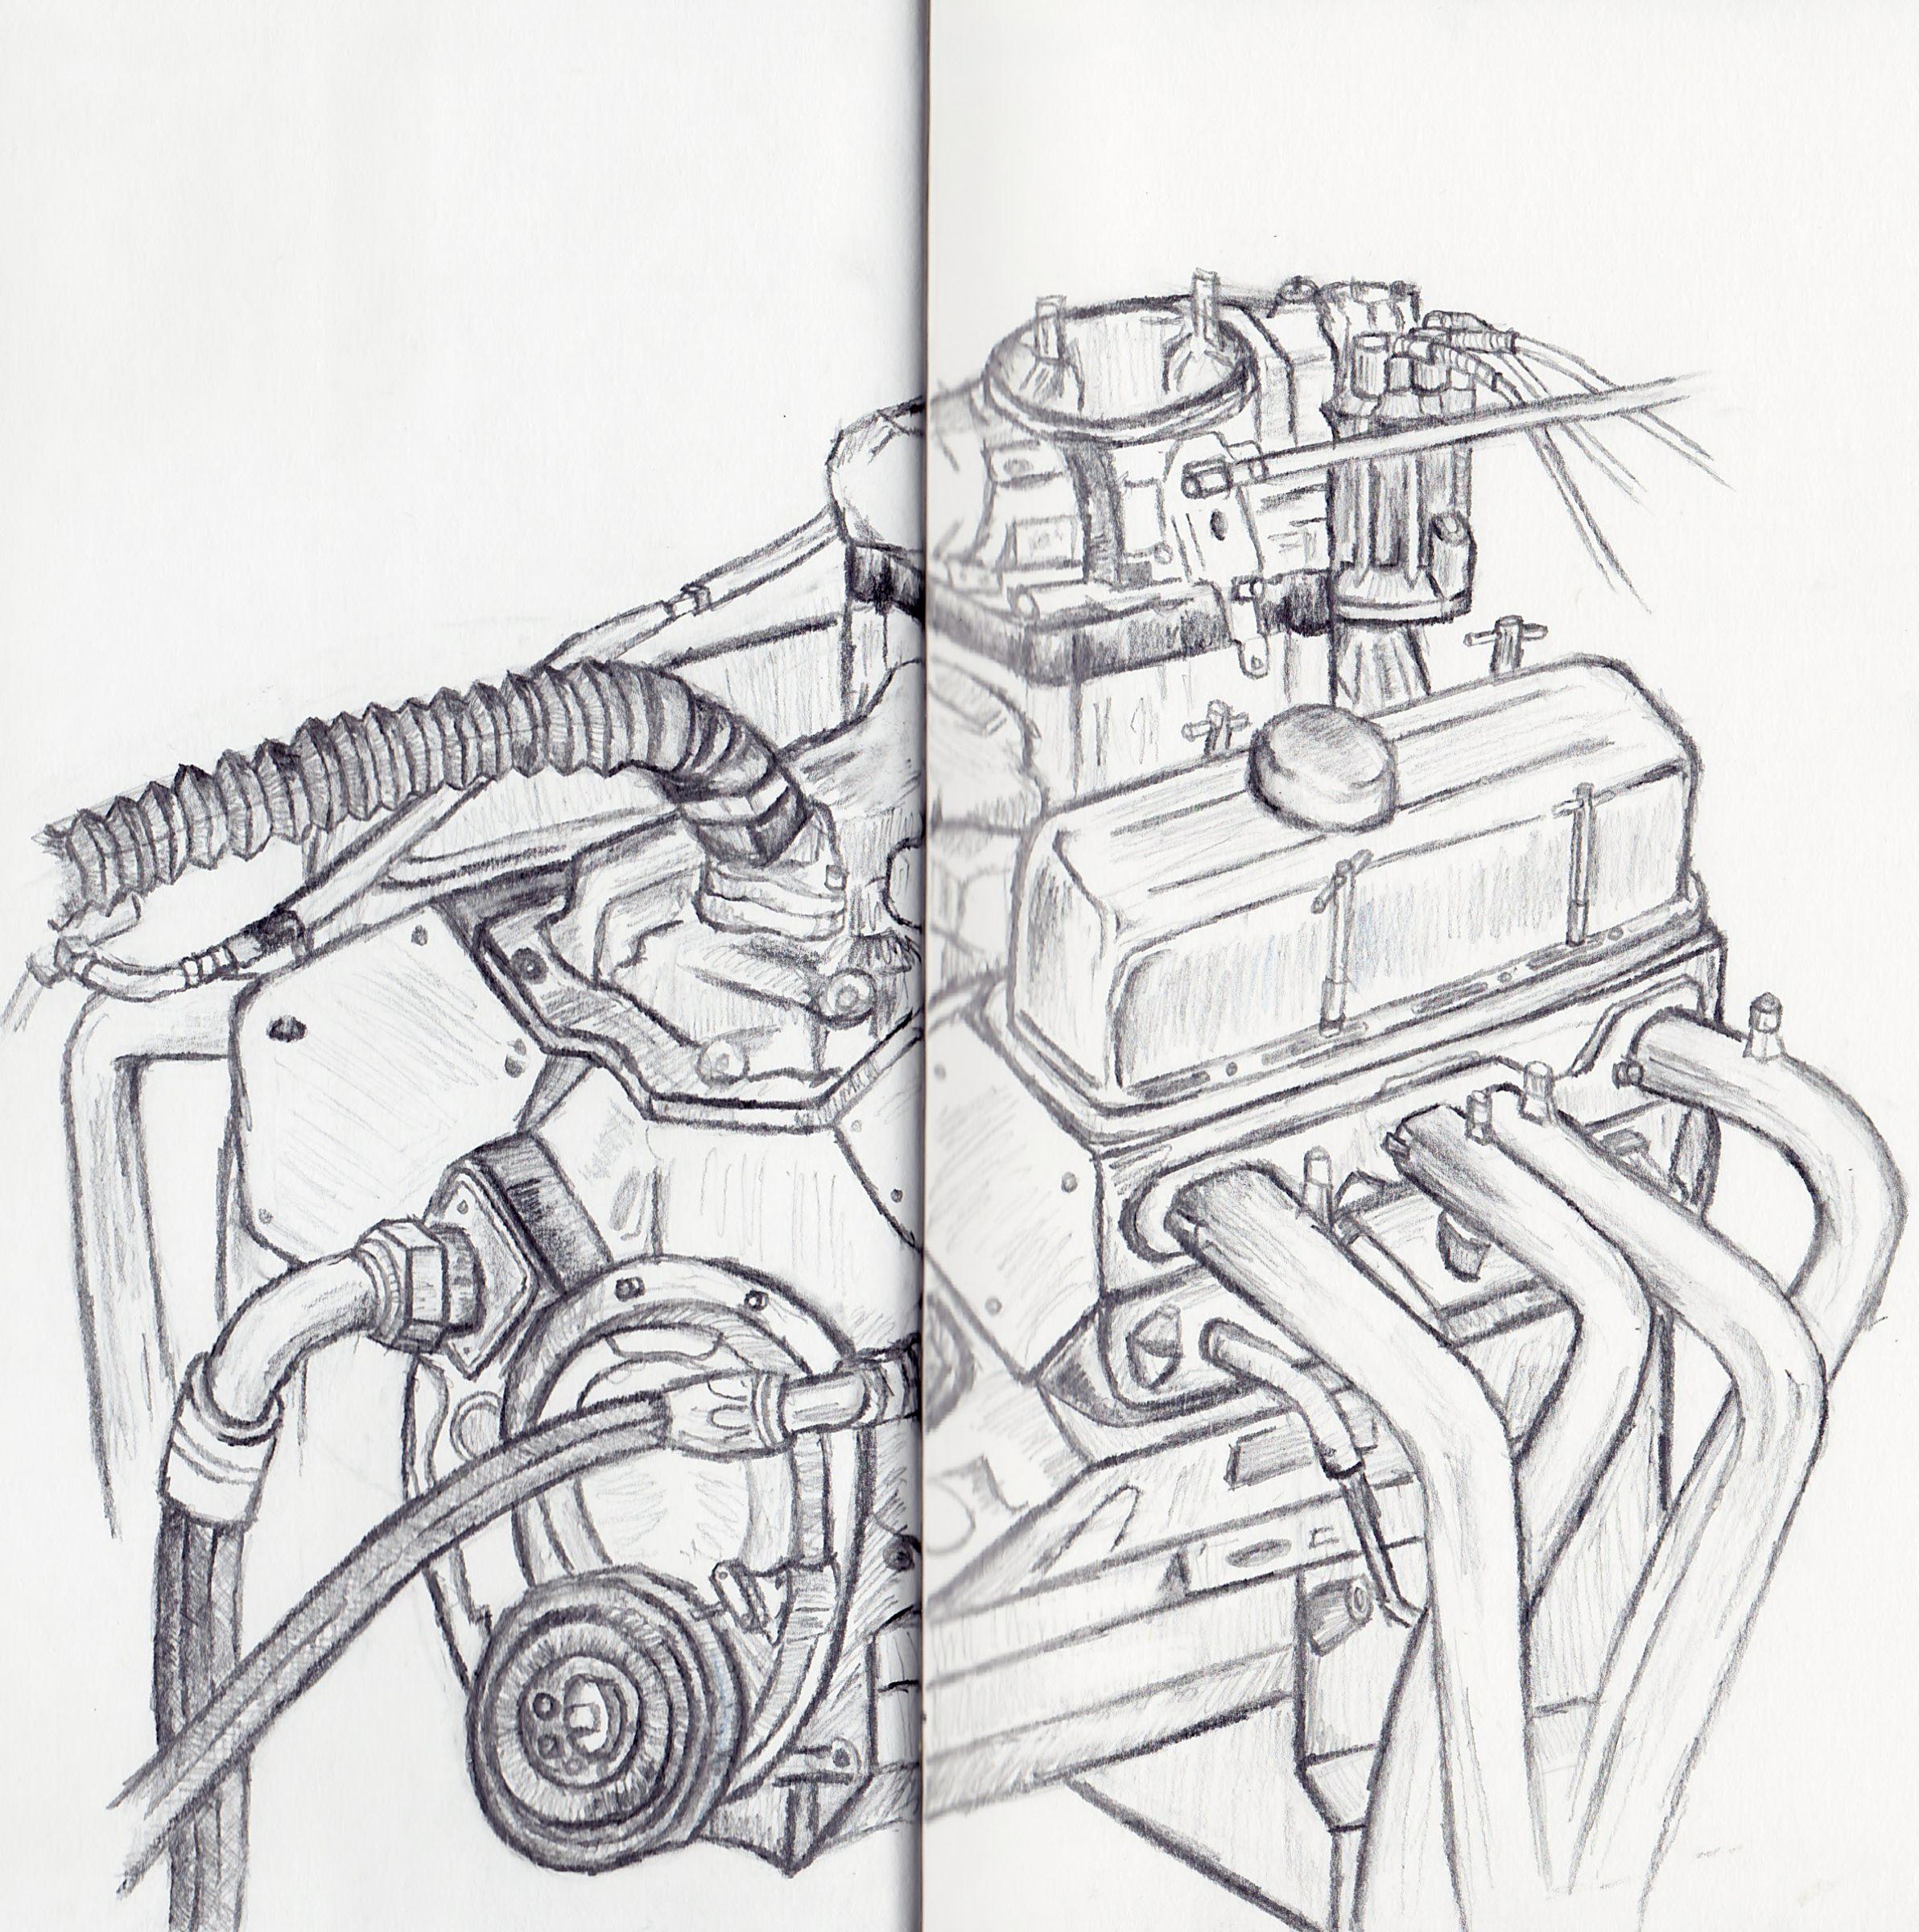 Car engine drawing, 12th July deadline | Drawings | Pinterest ...